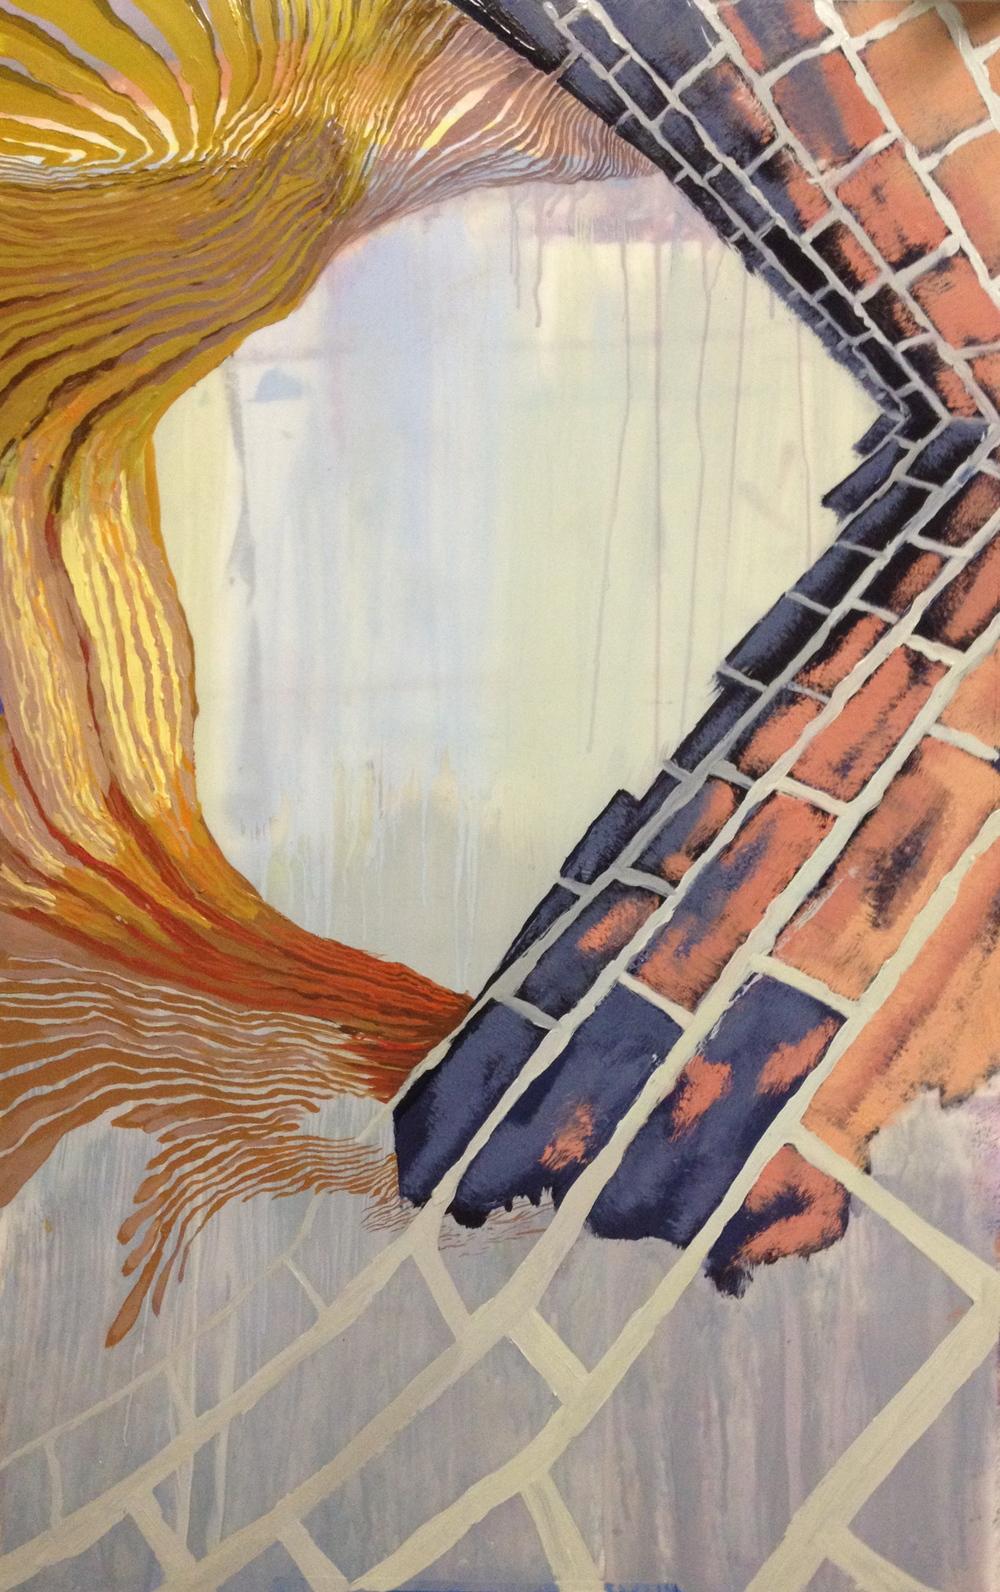 "Crapshoot     Oil on Mylar     40"" x 25""     2013"